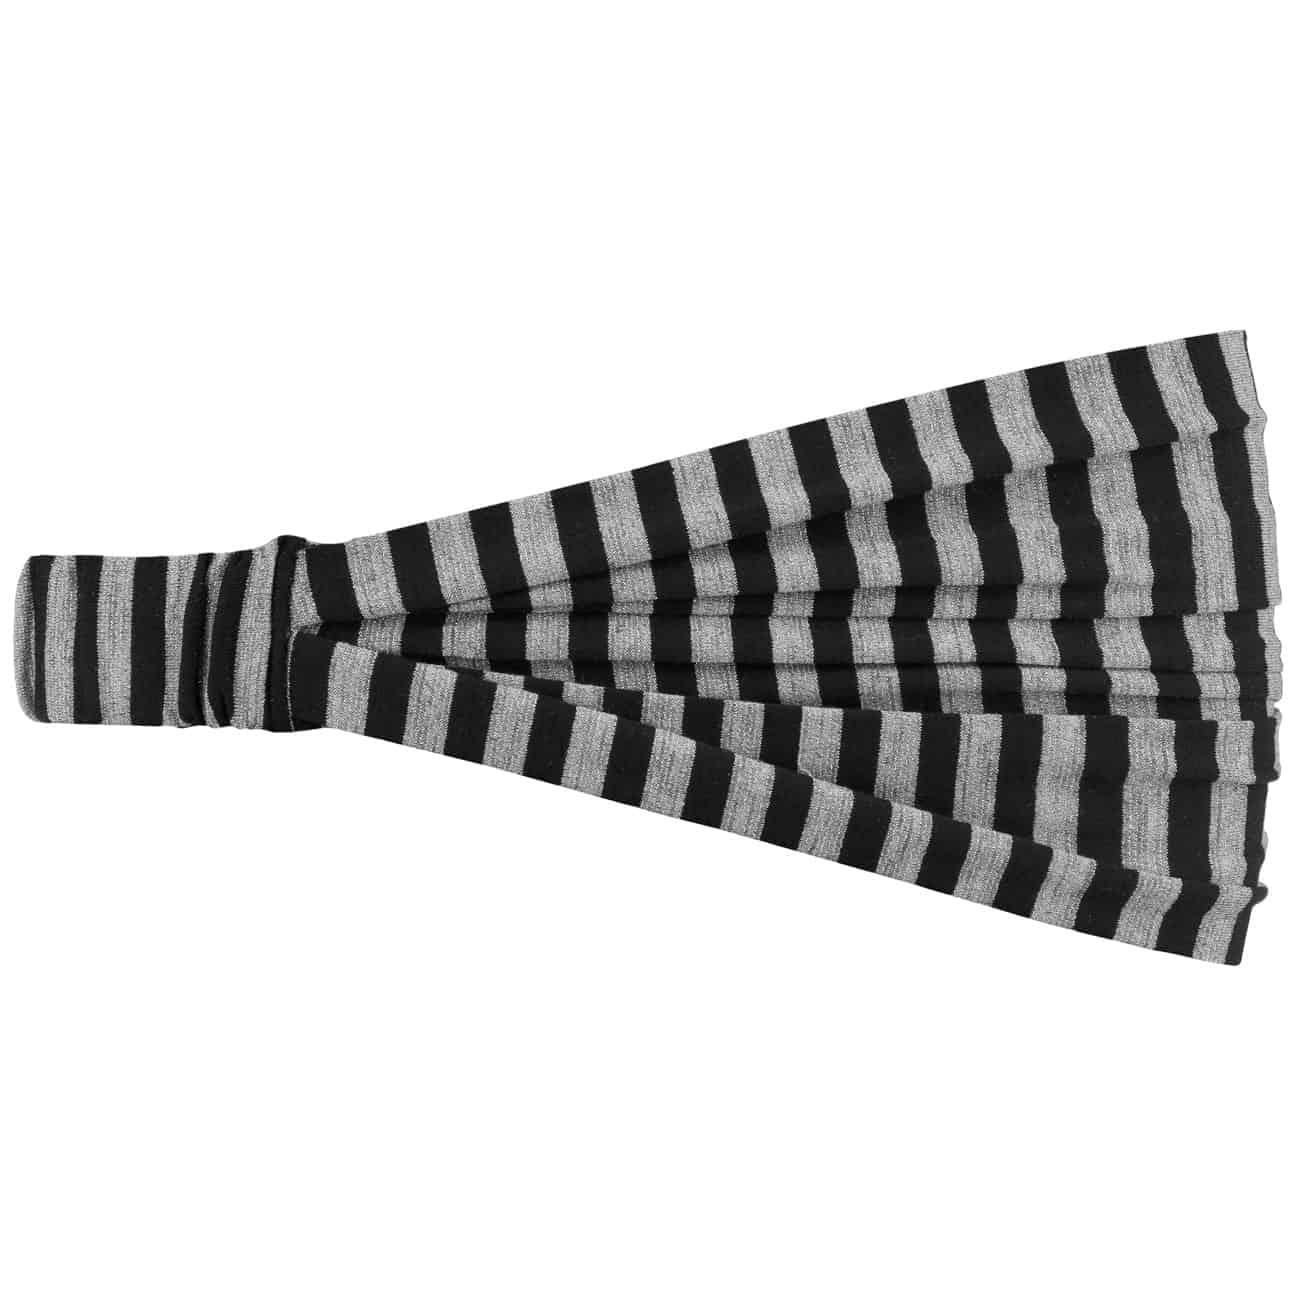 Cinta 3 in 1 Lurex Stripes by Lipodo